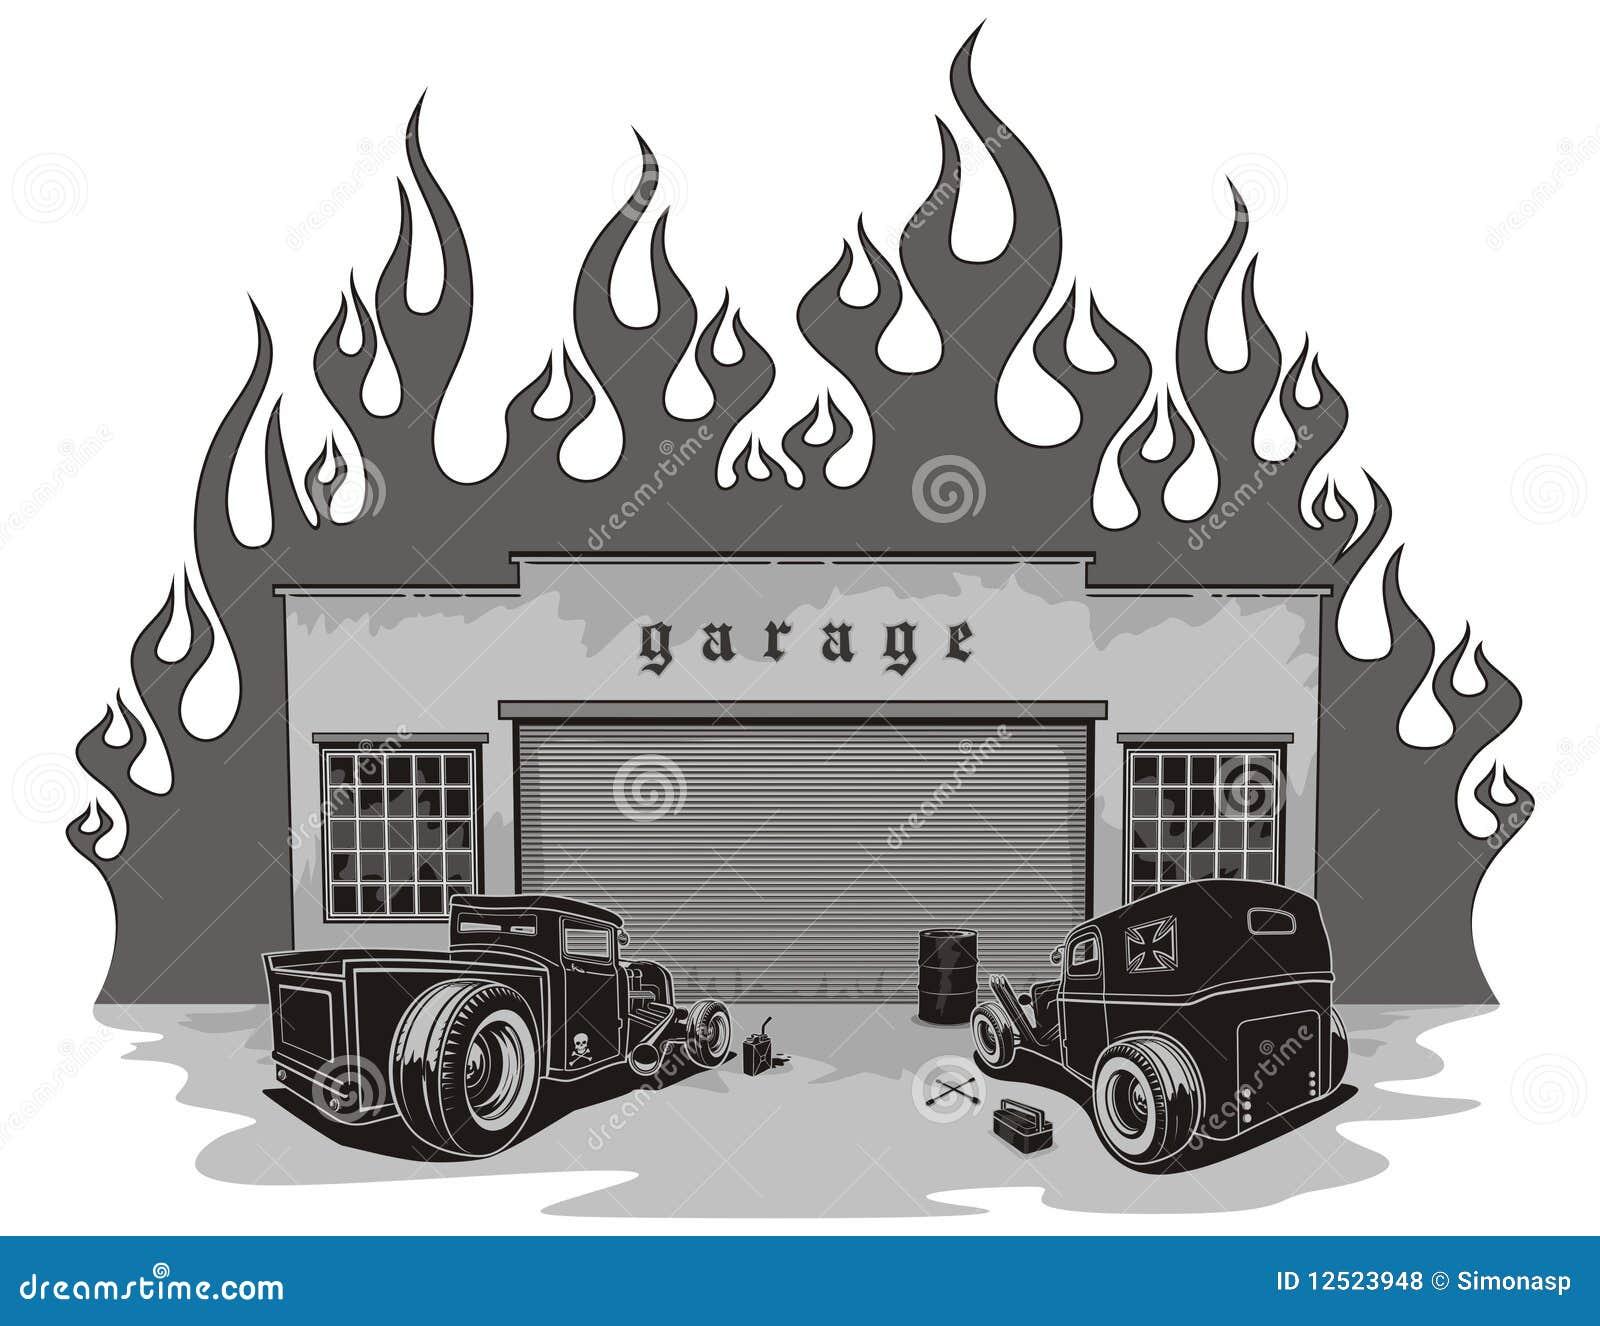 Rat Rods Garage Stock Vector Image Of Club Vehicle